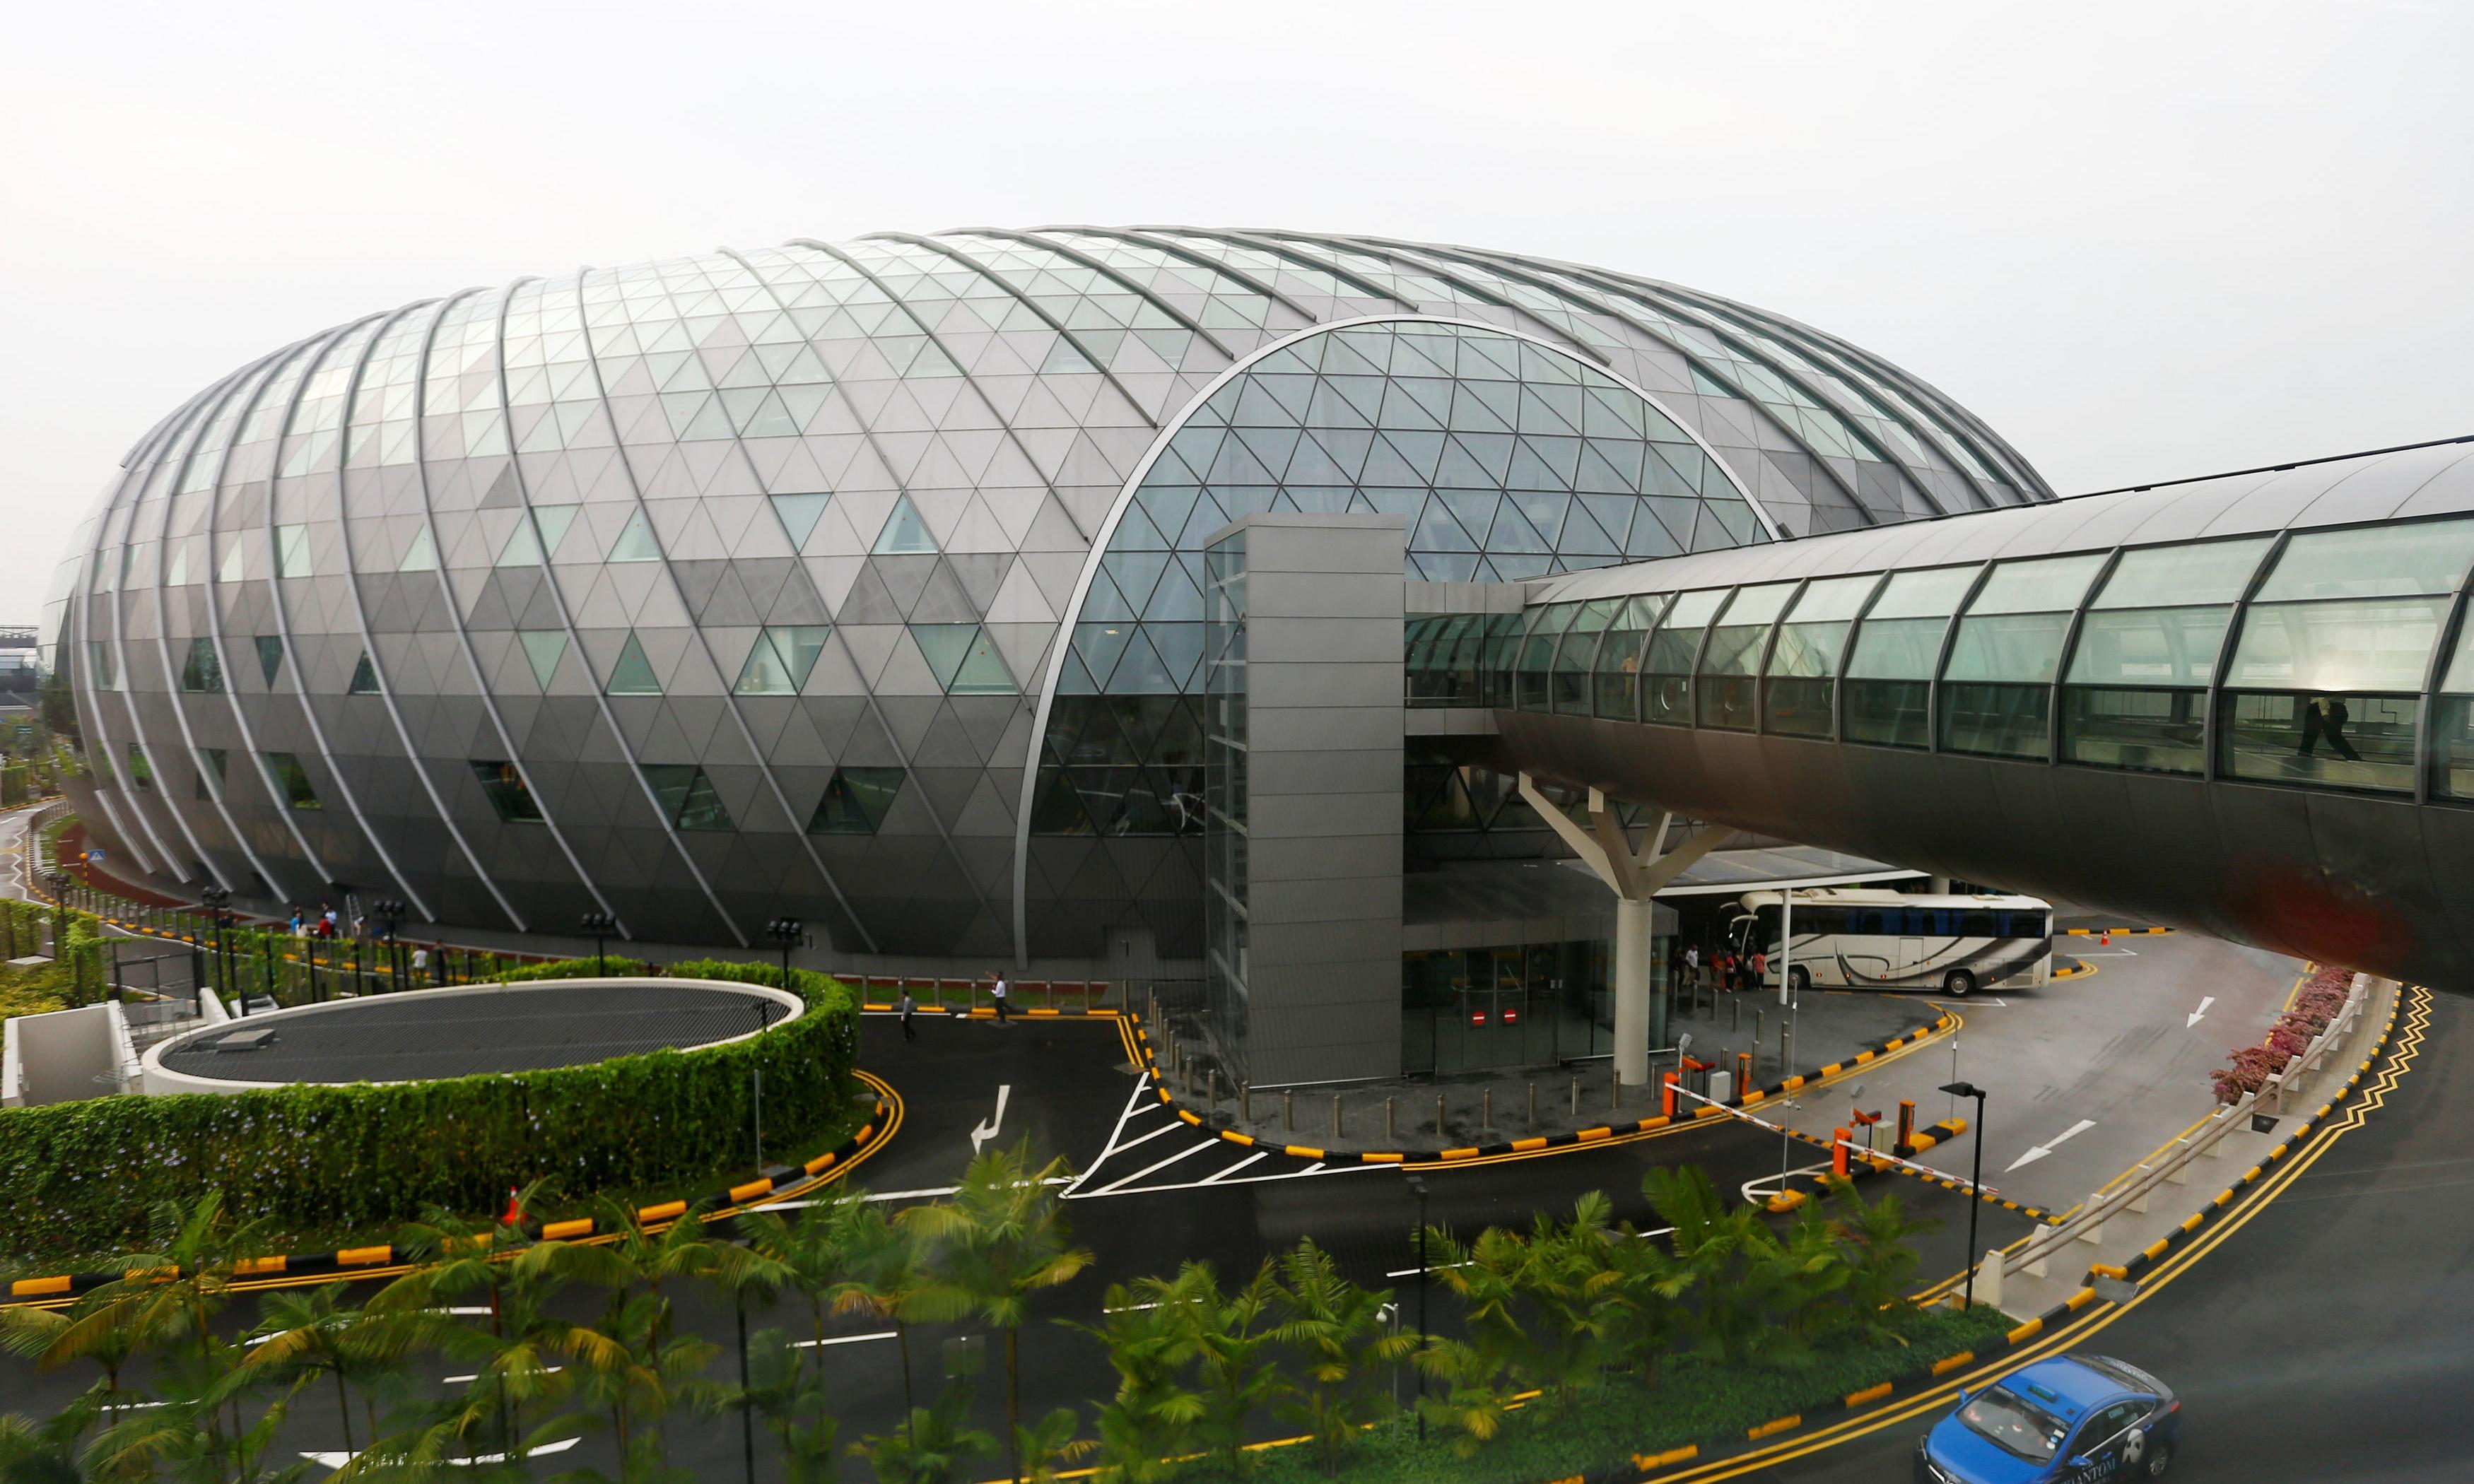 Drone sightings disrupt flights at Singapore's Changi airport